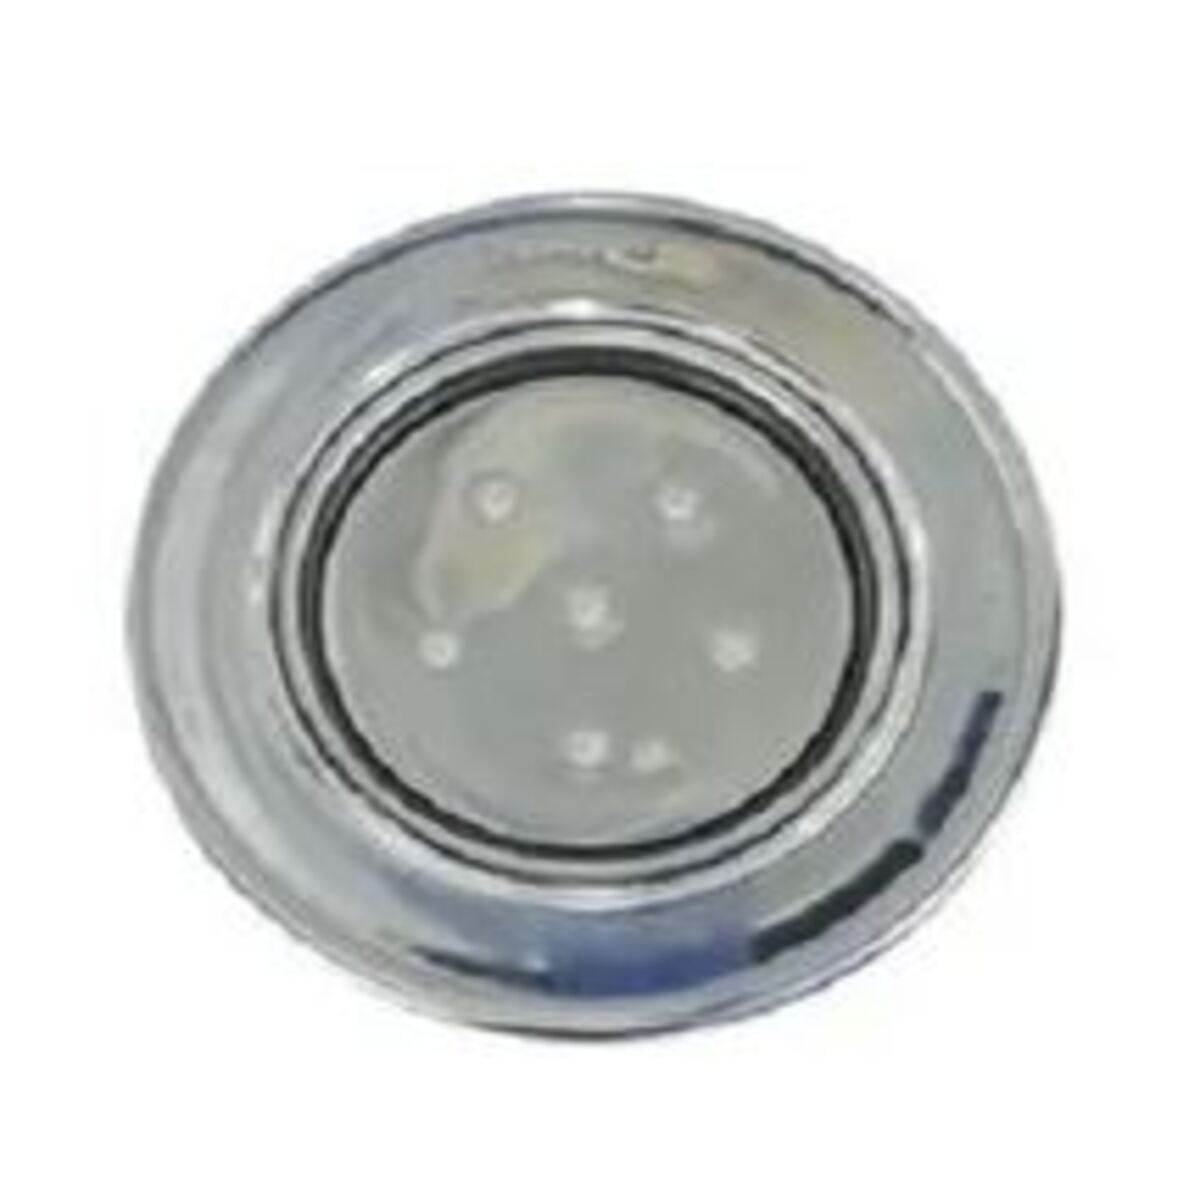 "Refletor Steel Super Led 6 Branco Inox com Plug 1/2"" Pooltec"